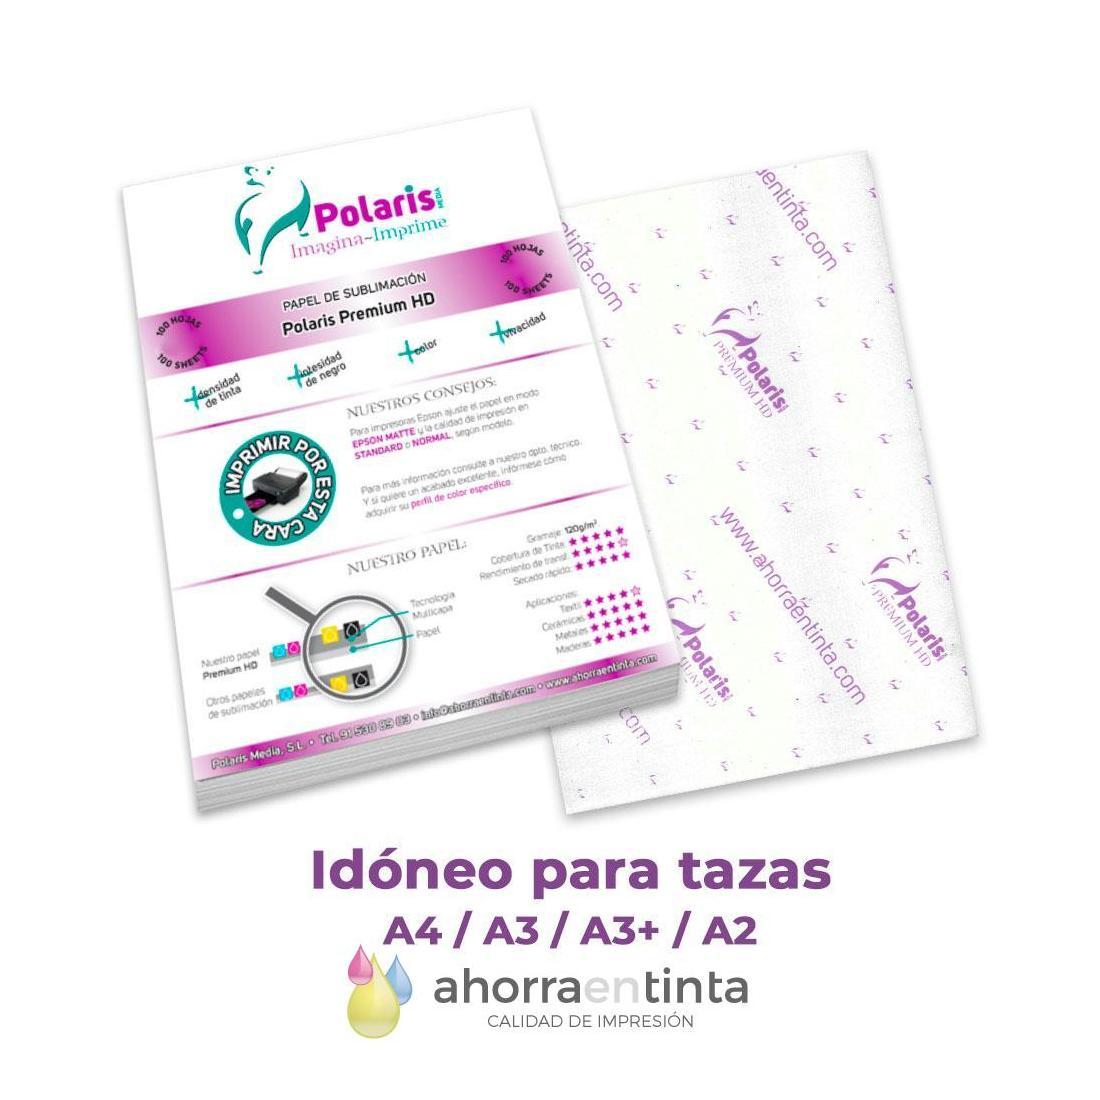 Papel sublimación Polaris PREMIUM HD, para impresoras Epson, pack 100 hojas